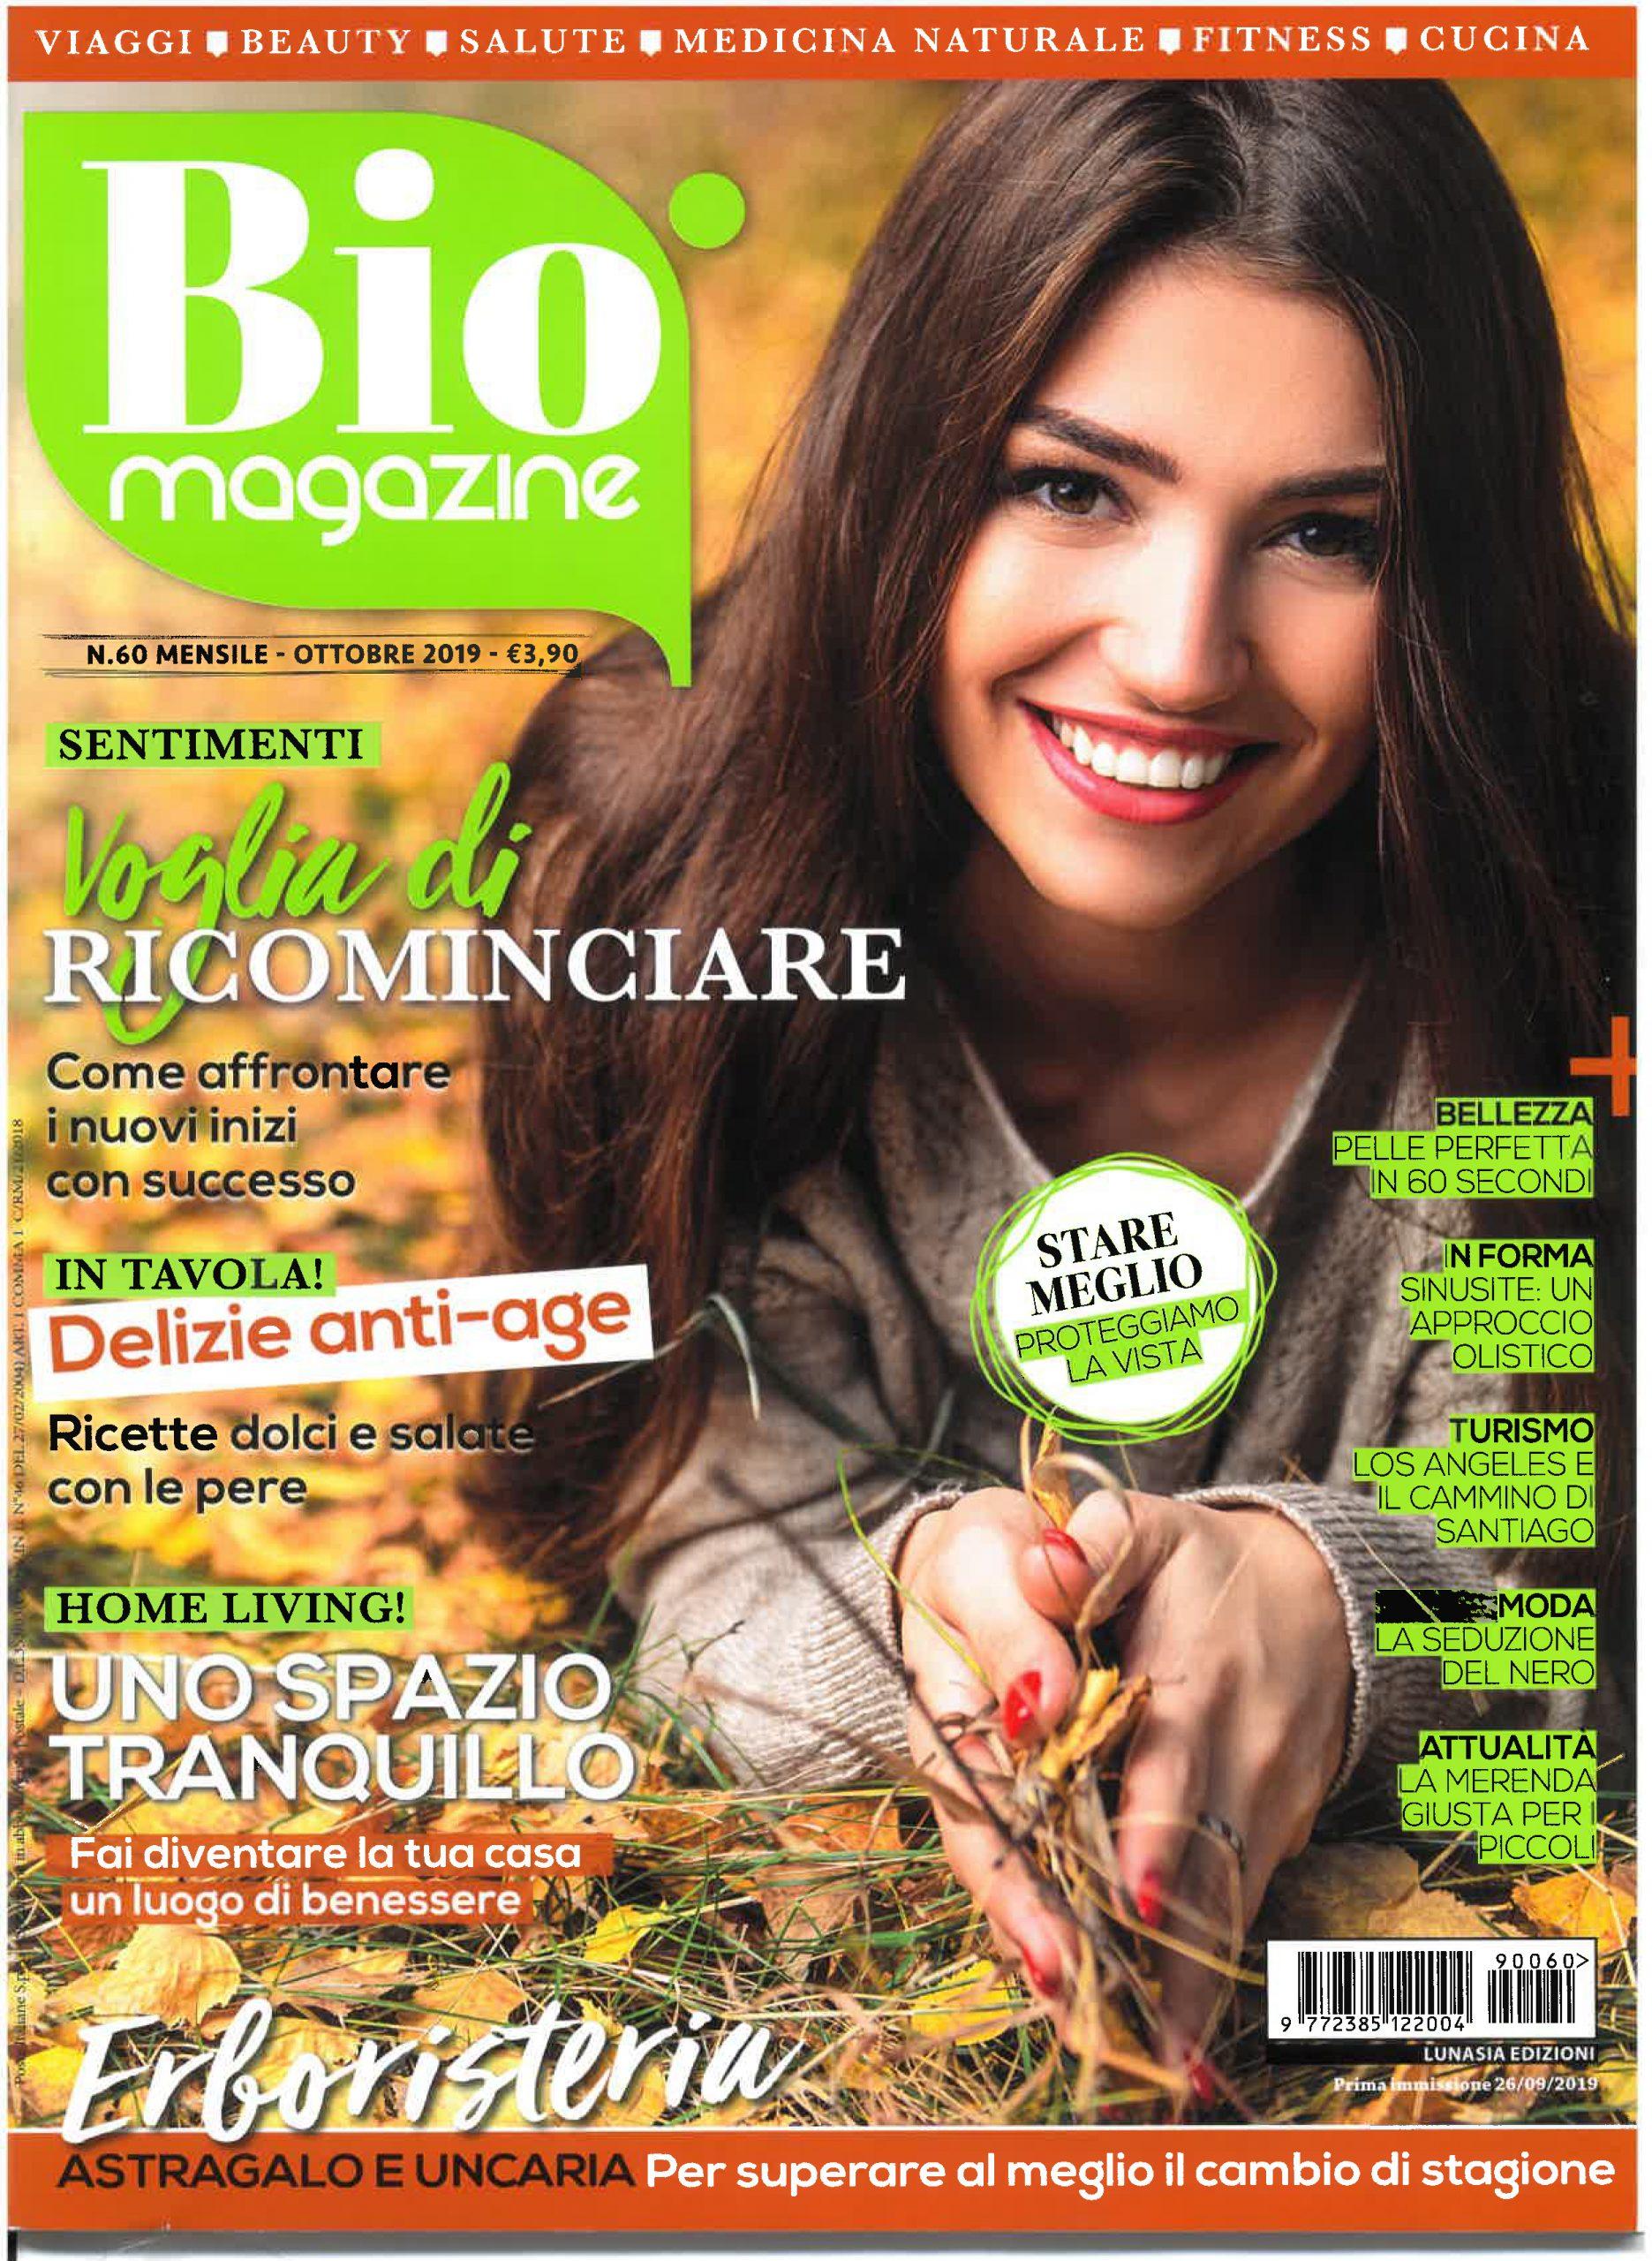 Lunasia, Bio Magazine, ottobre 2019